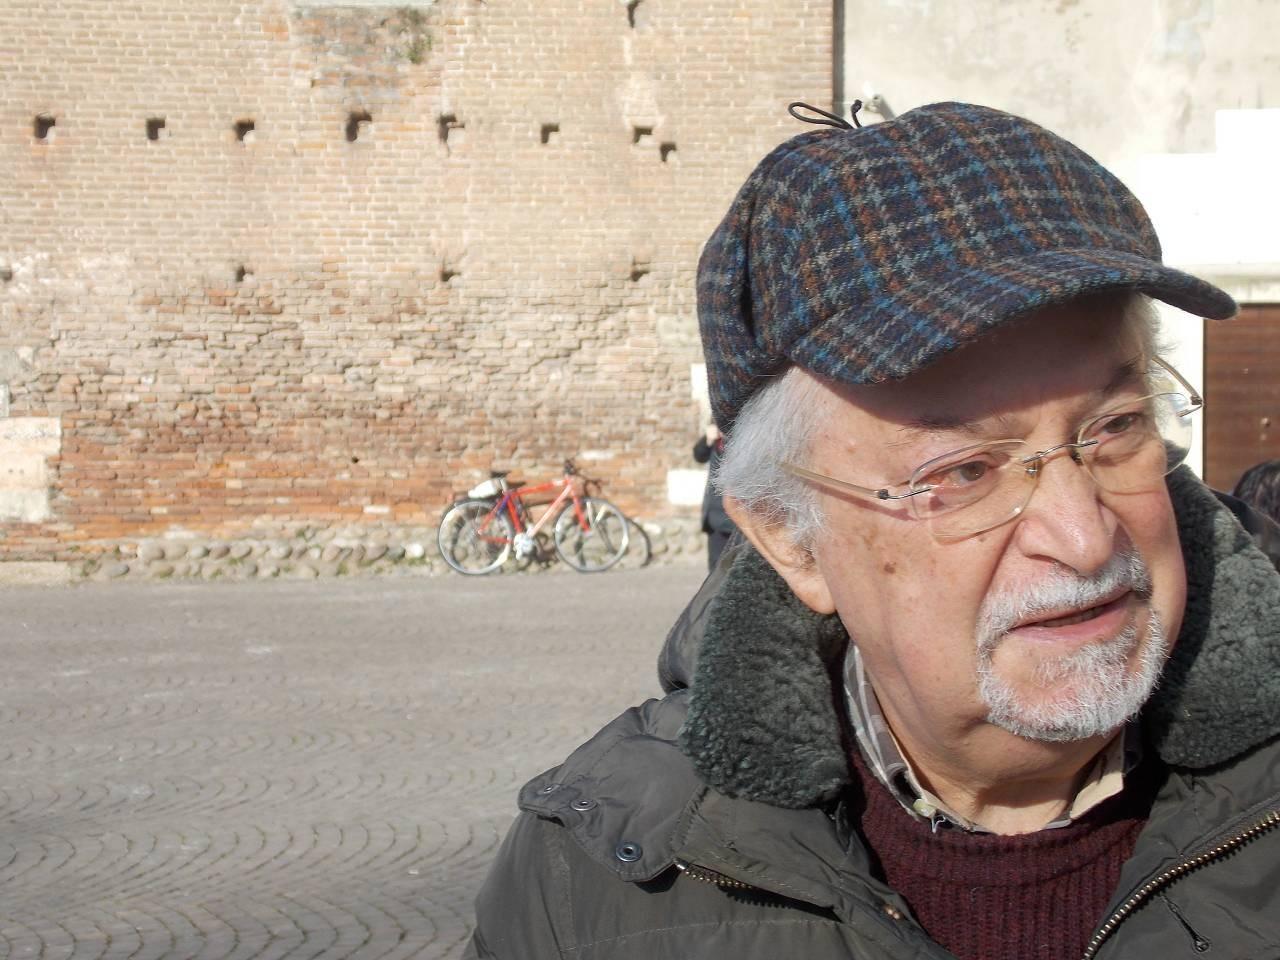 Antonio Jevolela, sudija u penziji: prevarih se